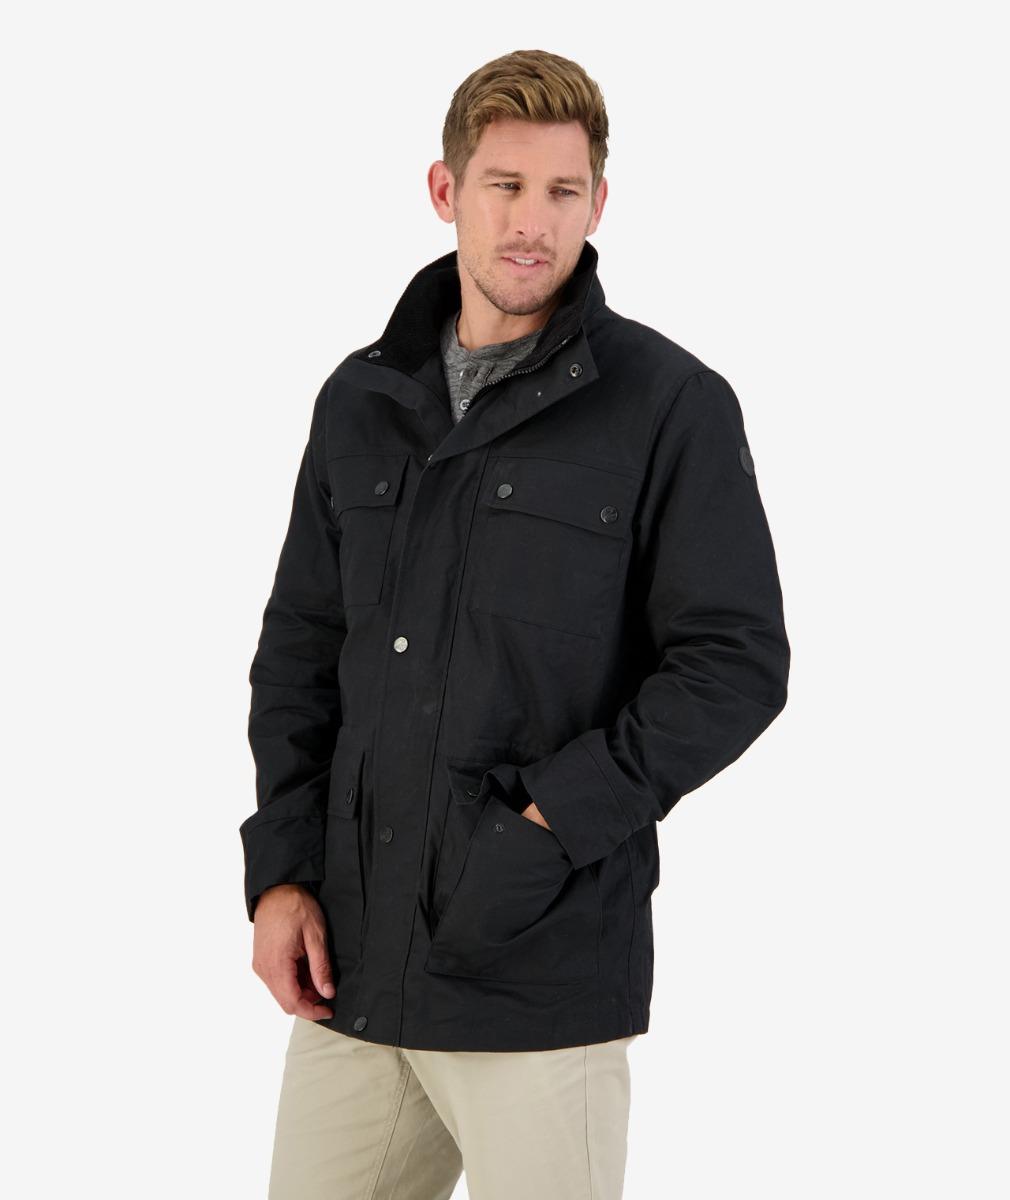 Glenore Oilskin Jacket in Black